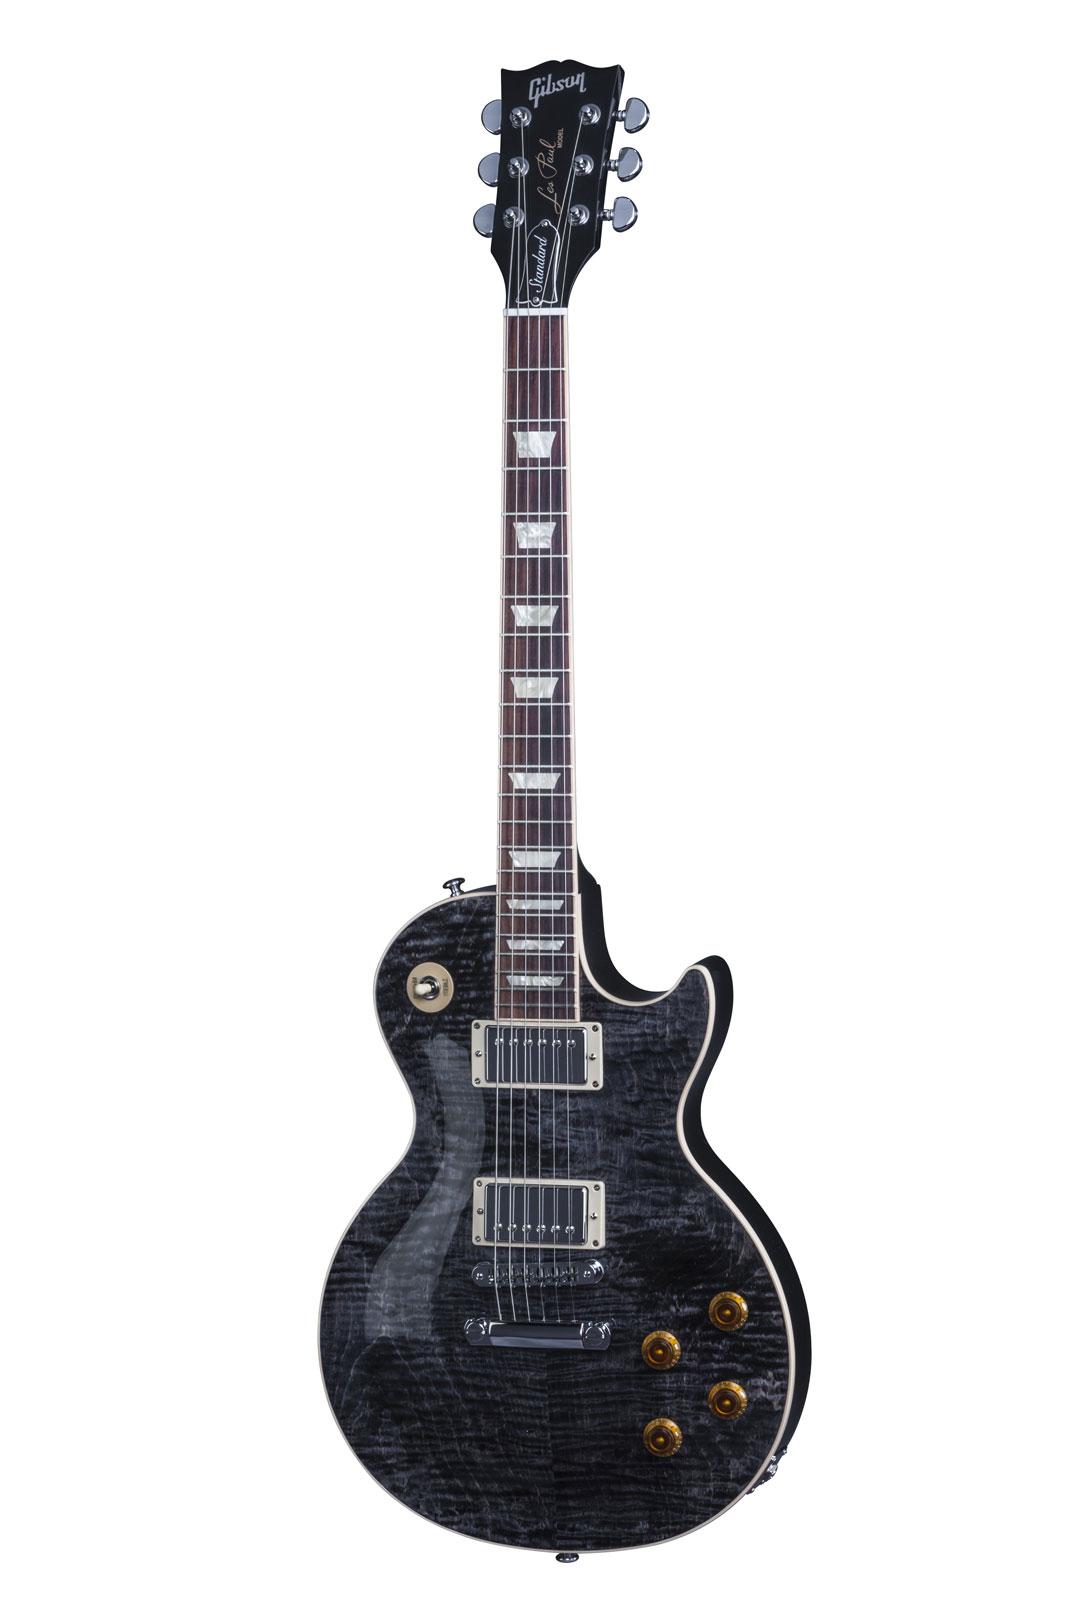 Gibson Les Paul Lp Standard 2016 Hp Translucent Black + Etui